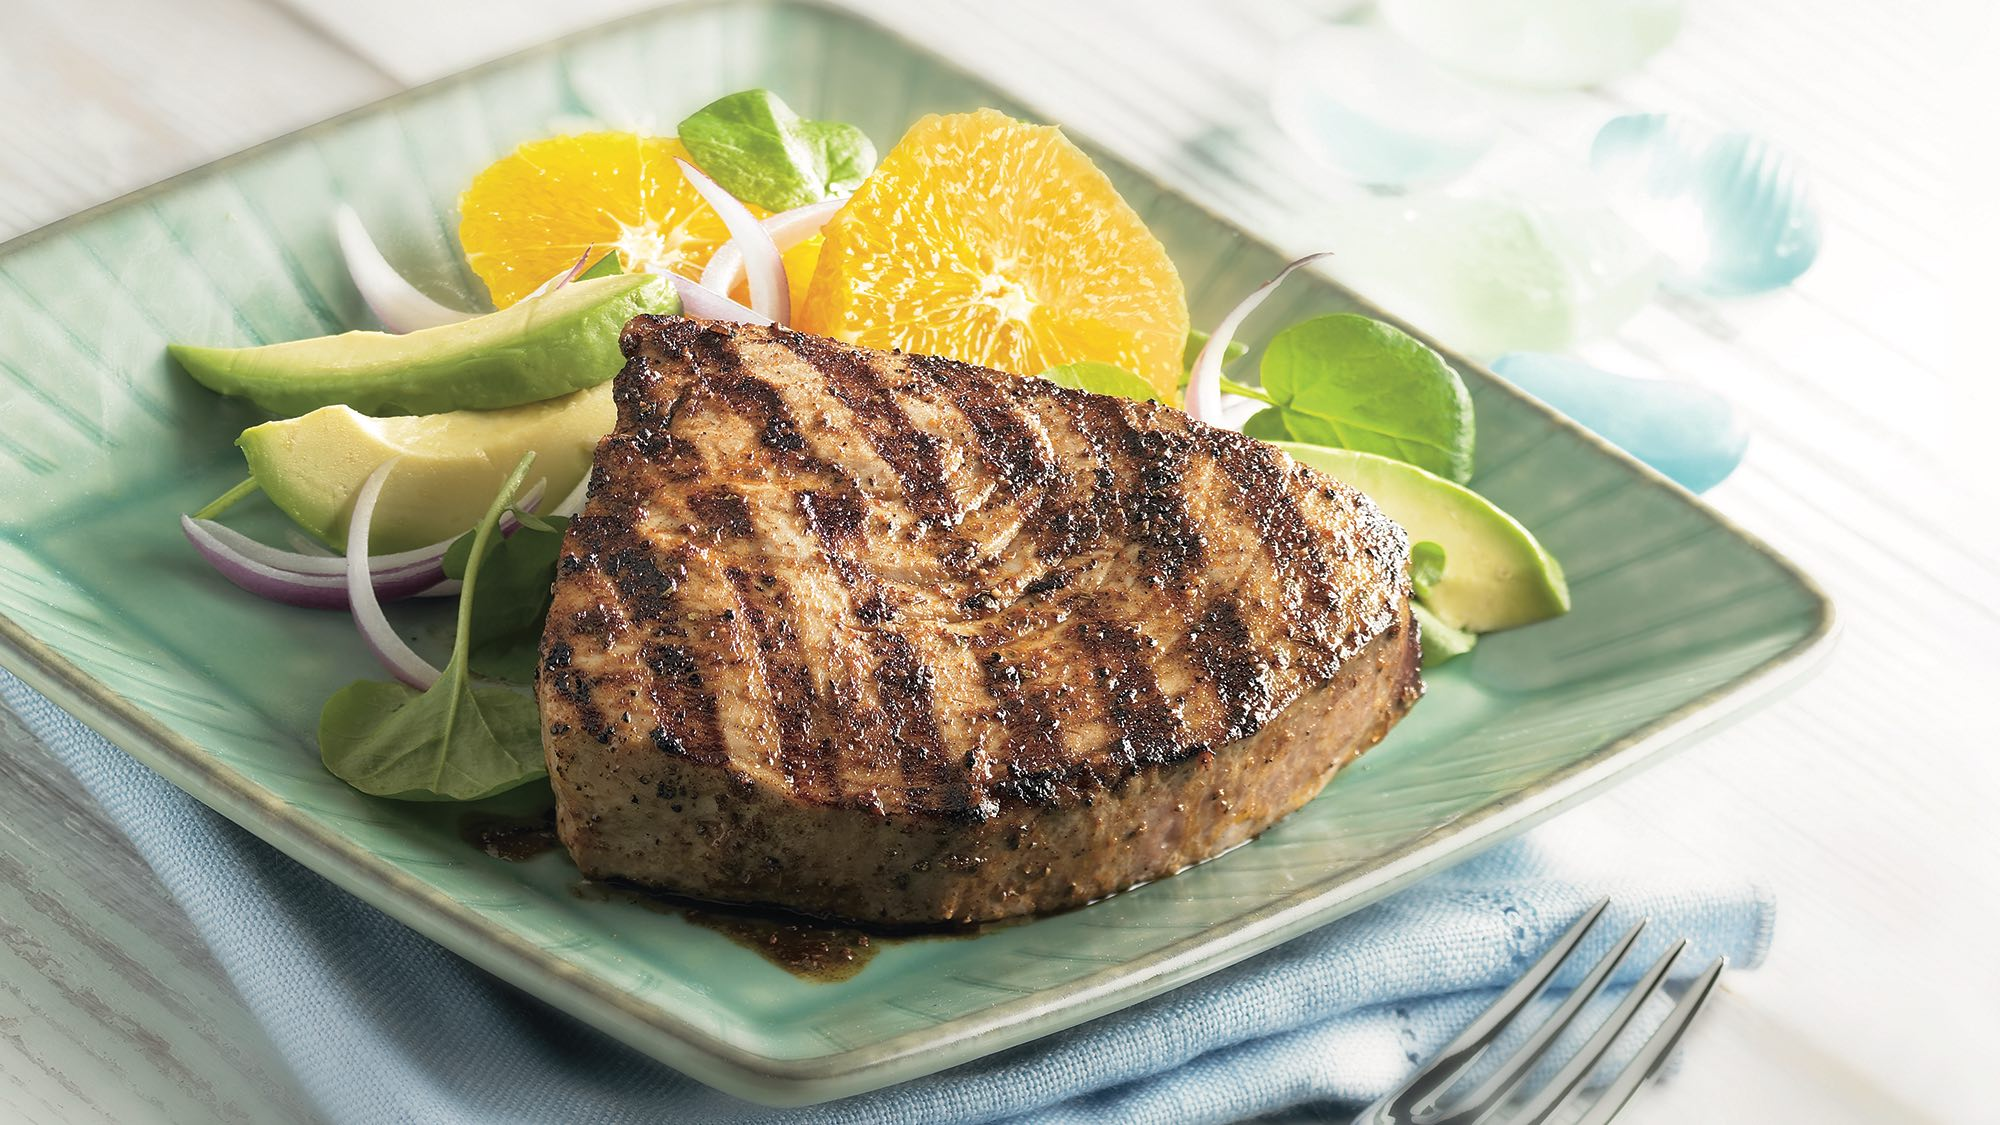 McCormick Caribbean Grilled Tuna